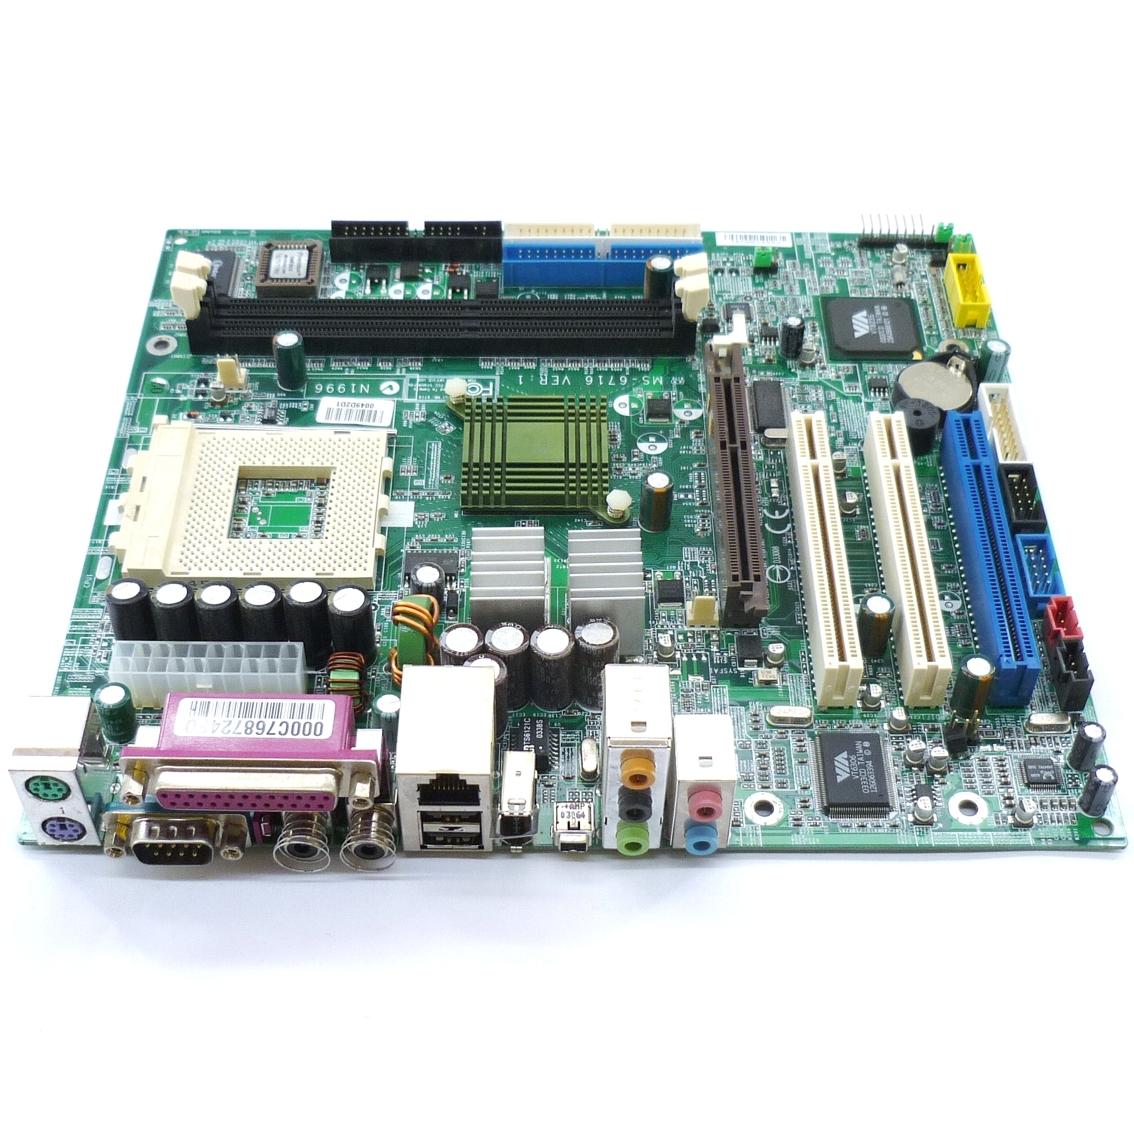 Hp Fxn1 E93839 Motherboard Specs